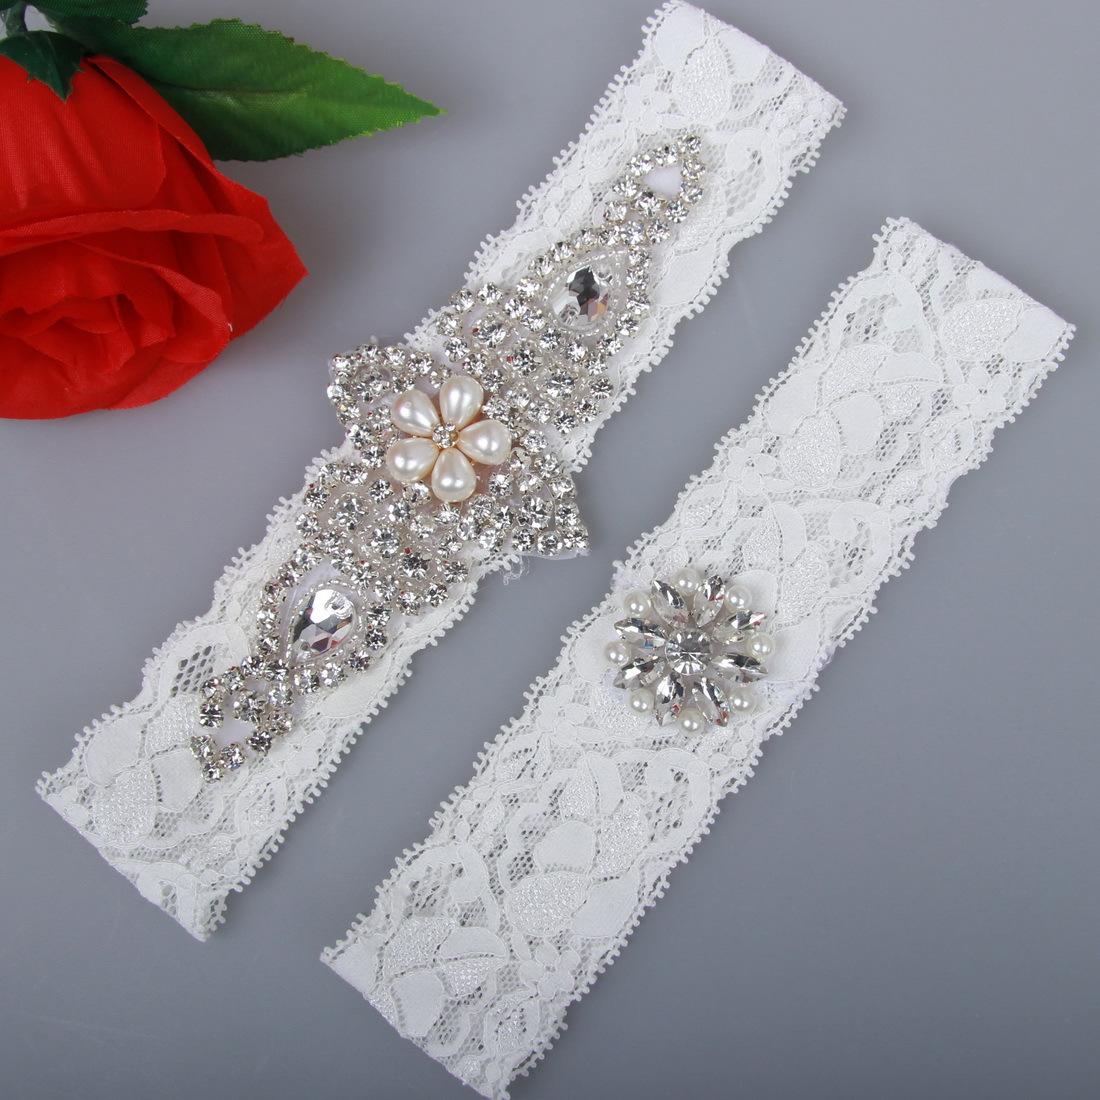 Sexy Bridal Garters Lace Rhinestones Pearls Vintage Handmade Wedding Garter Set New With Bridal Leg Garter Belt Beads Plus Size